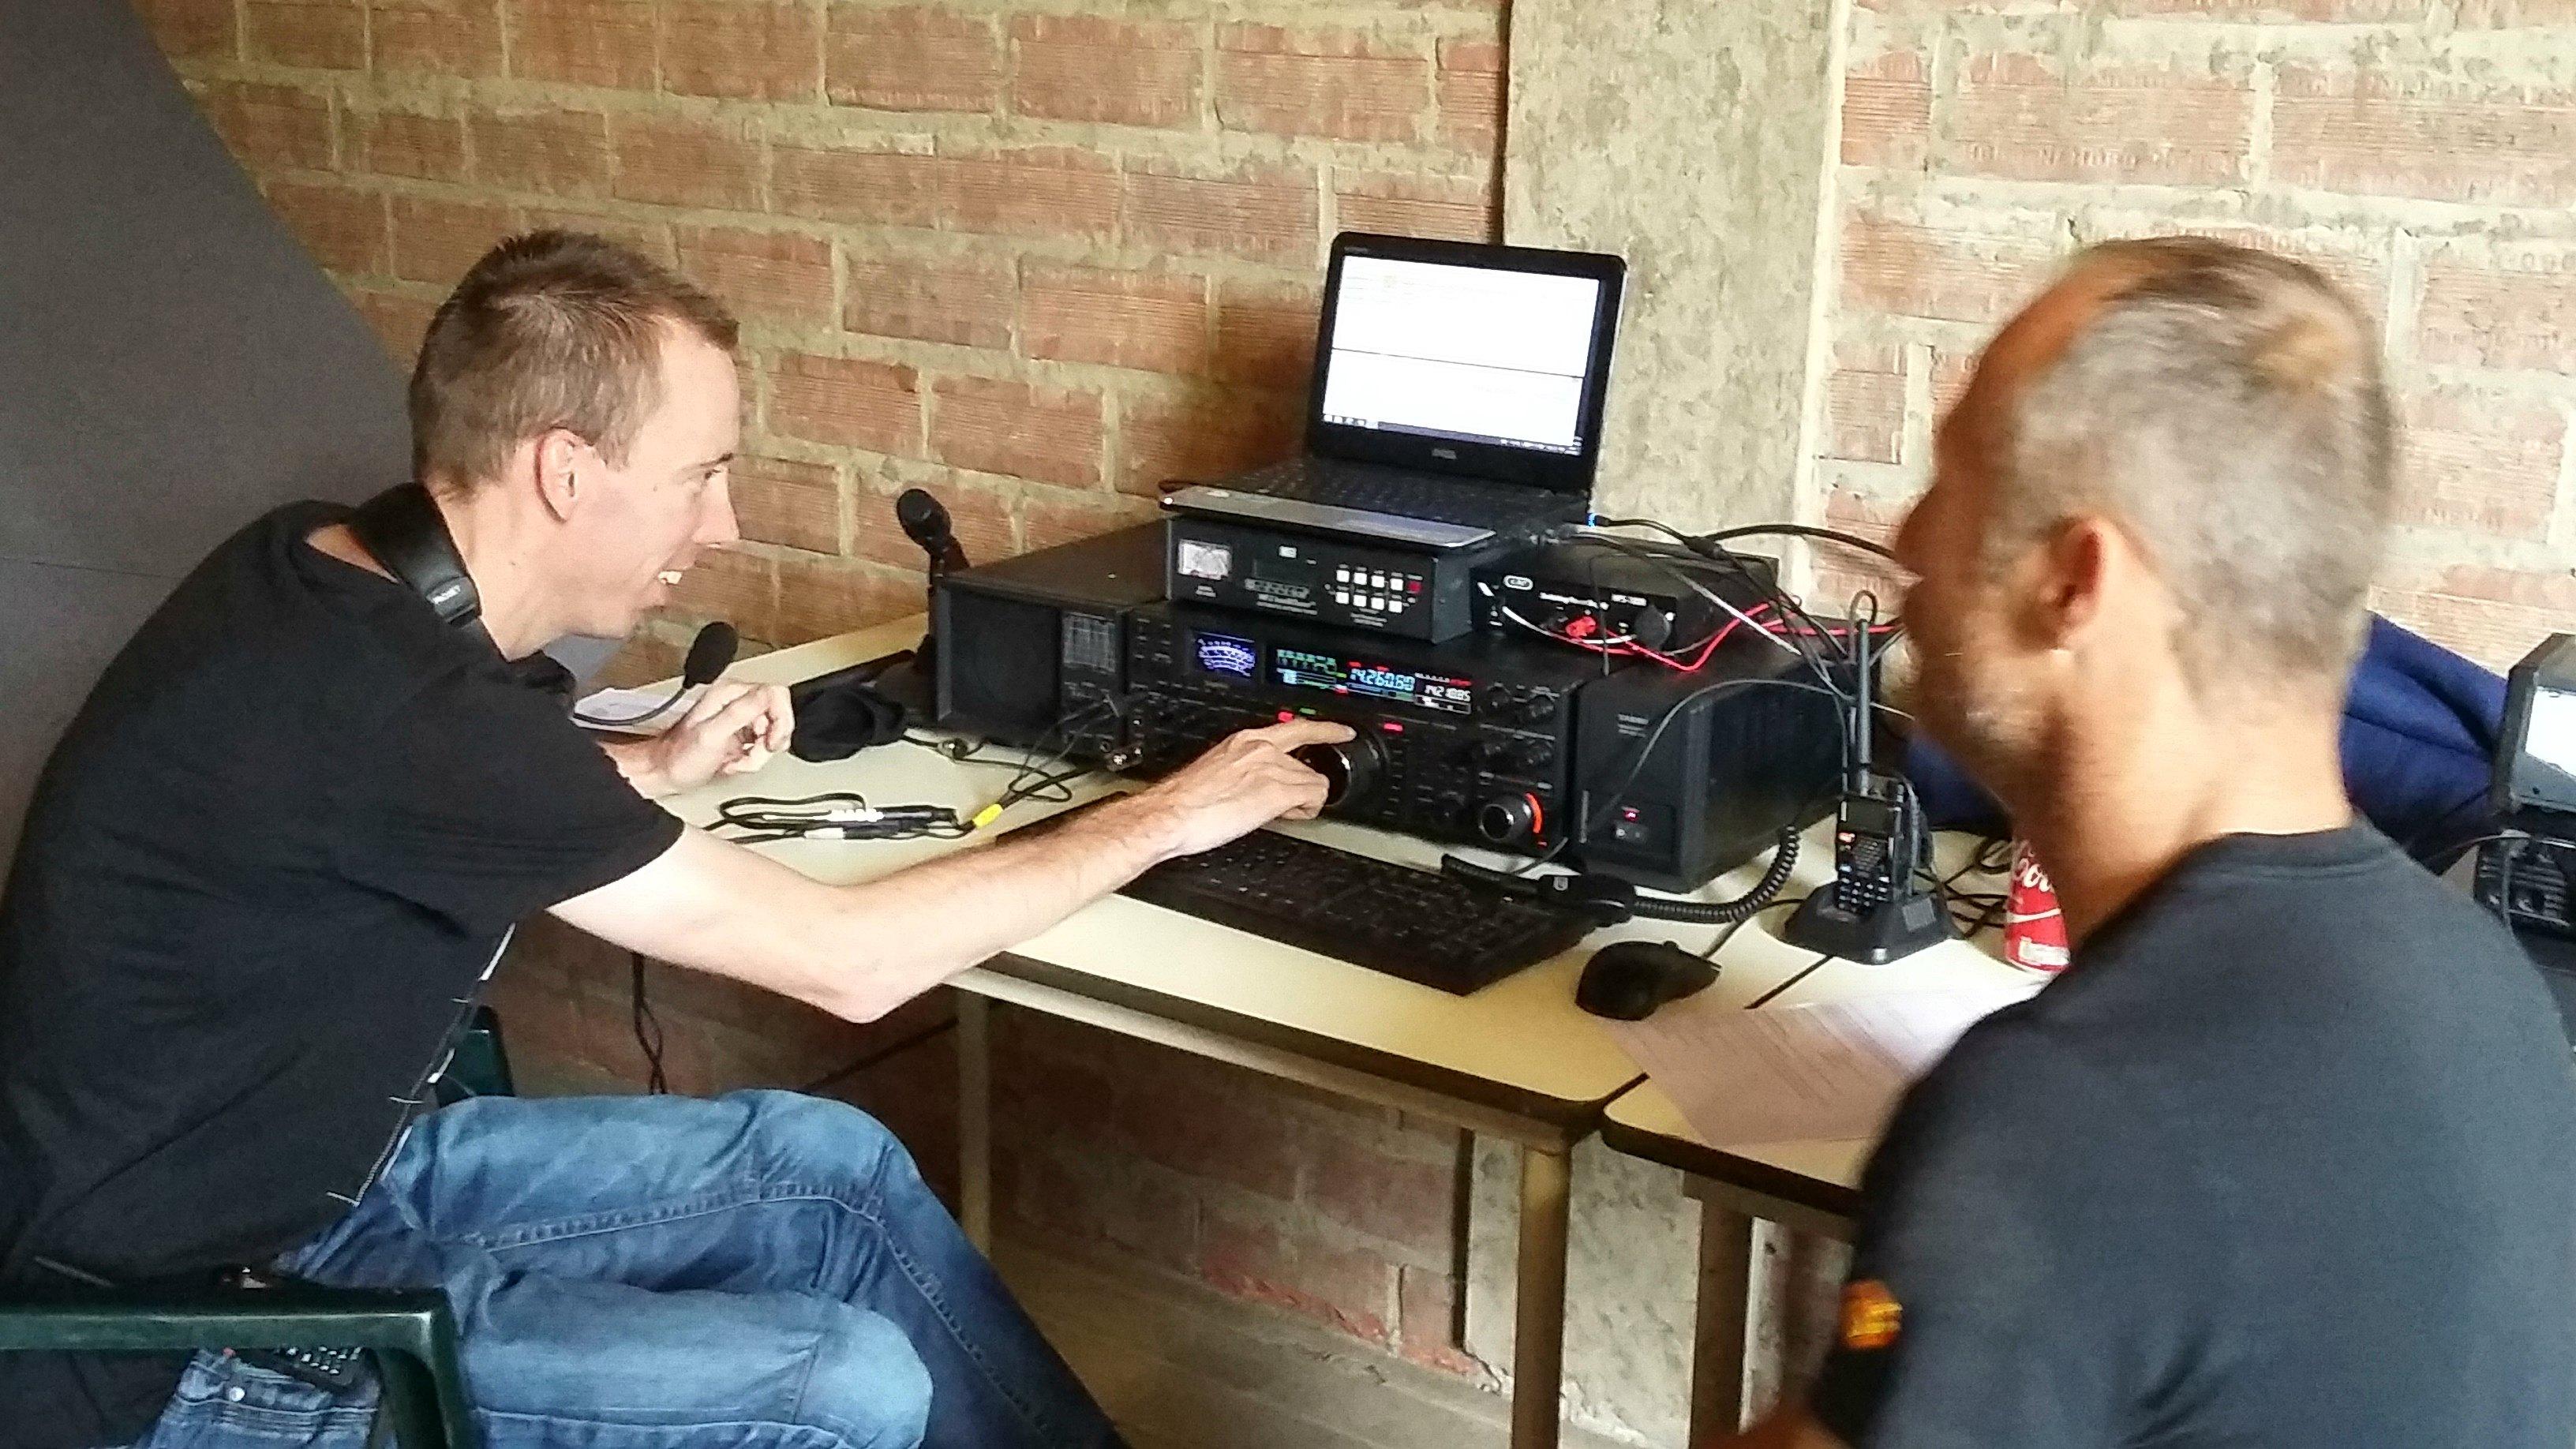 Radiozendamateurs 2.jpg